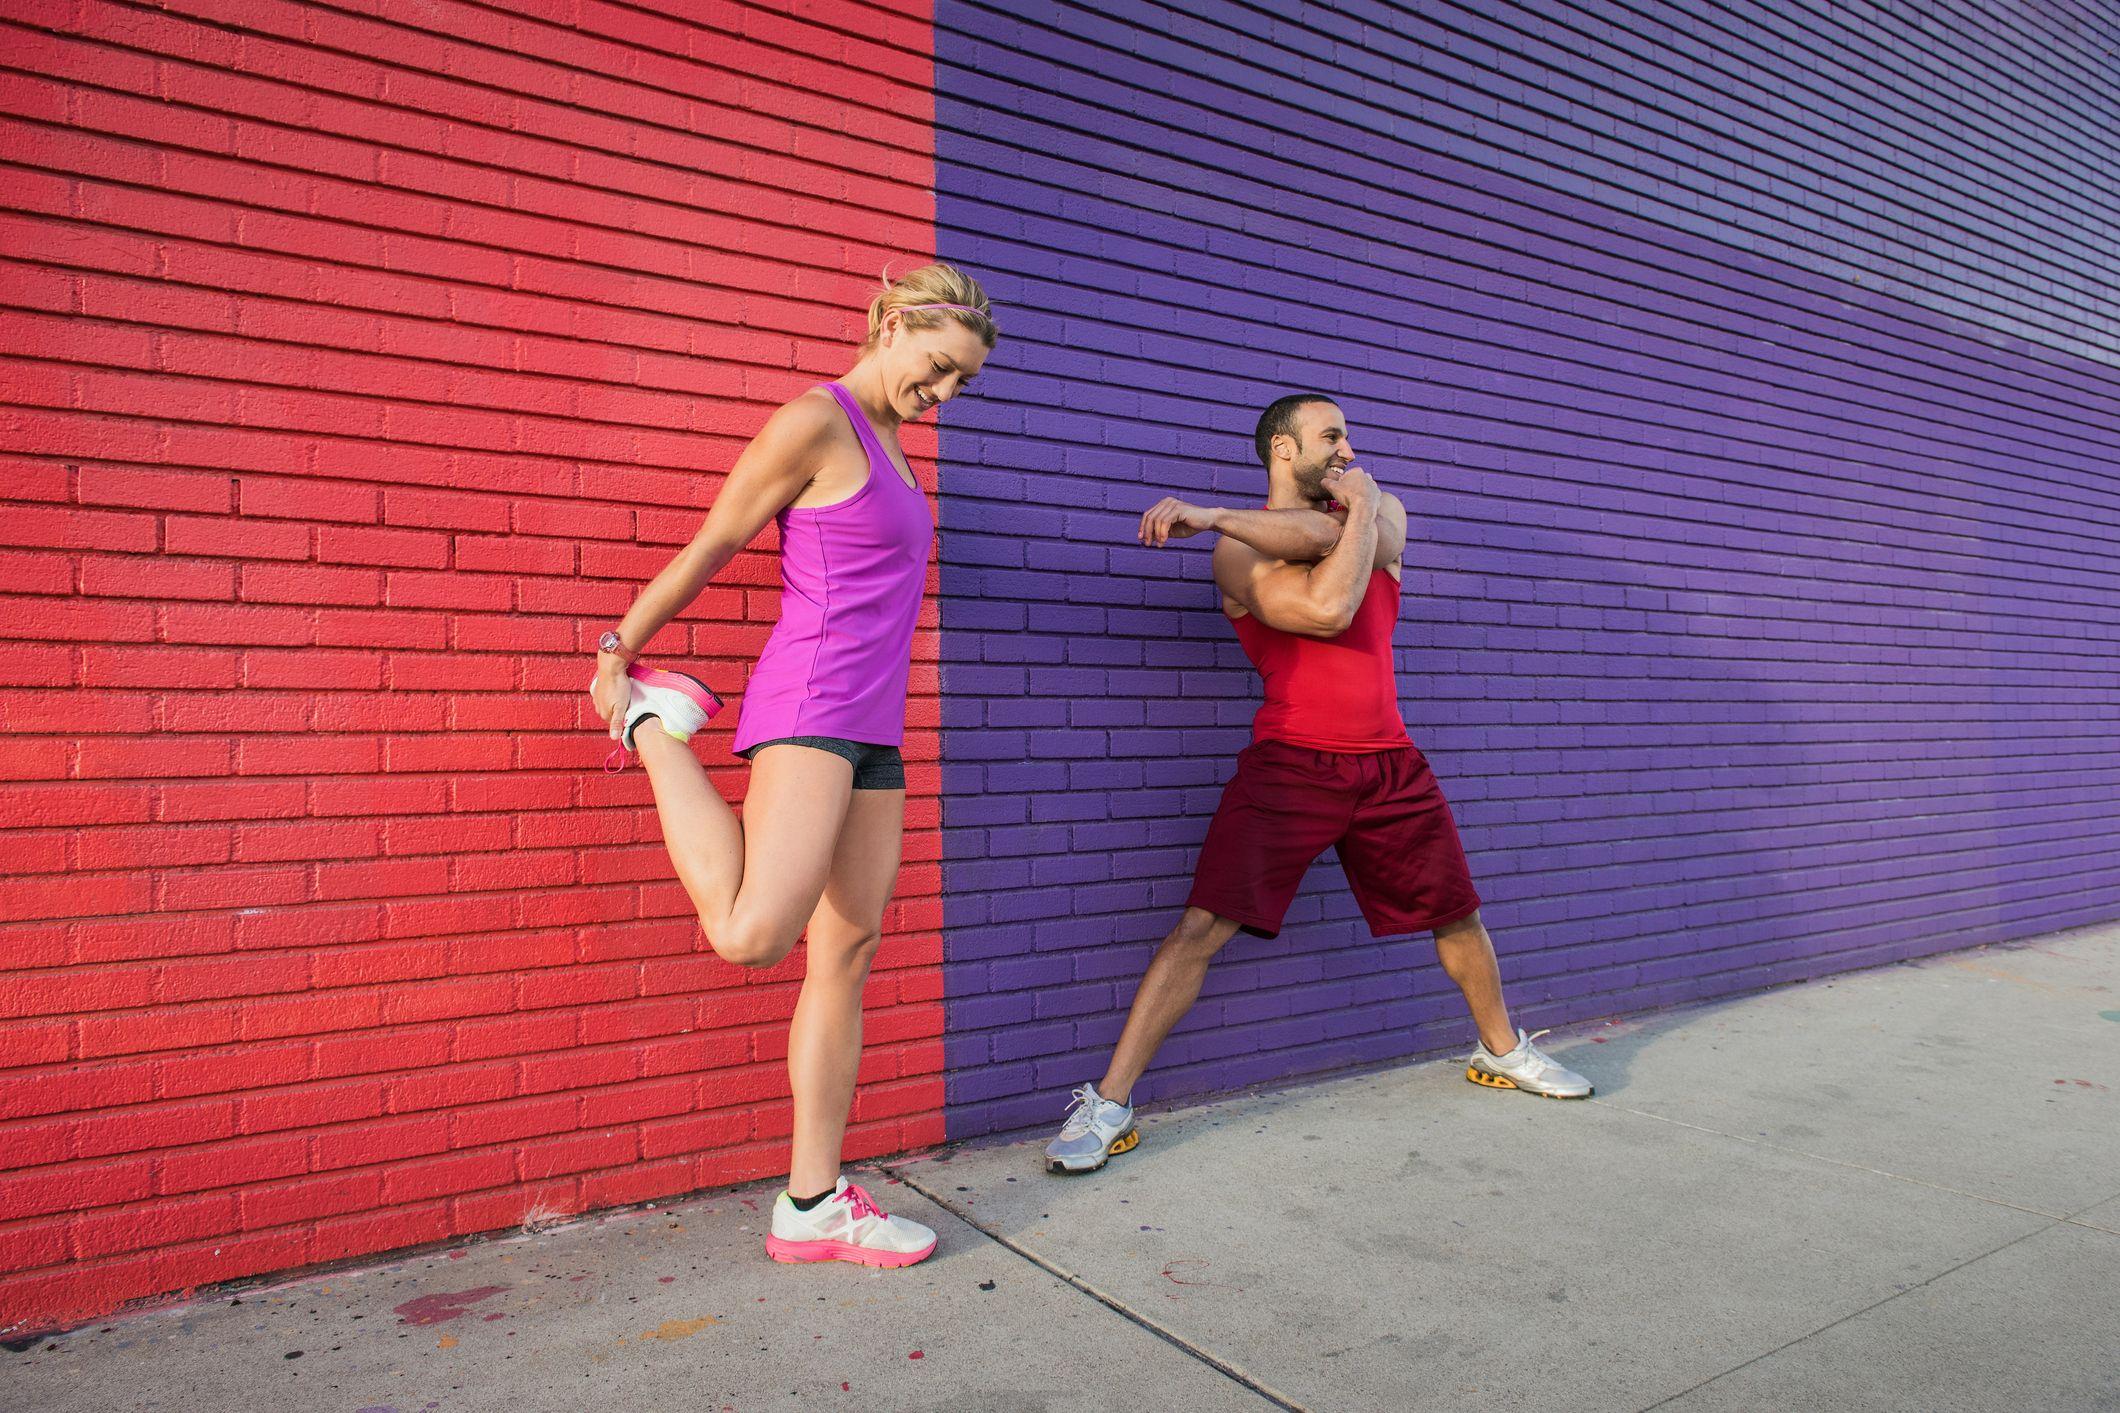 6 ways to improve your flexibility